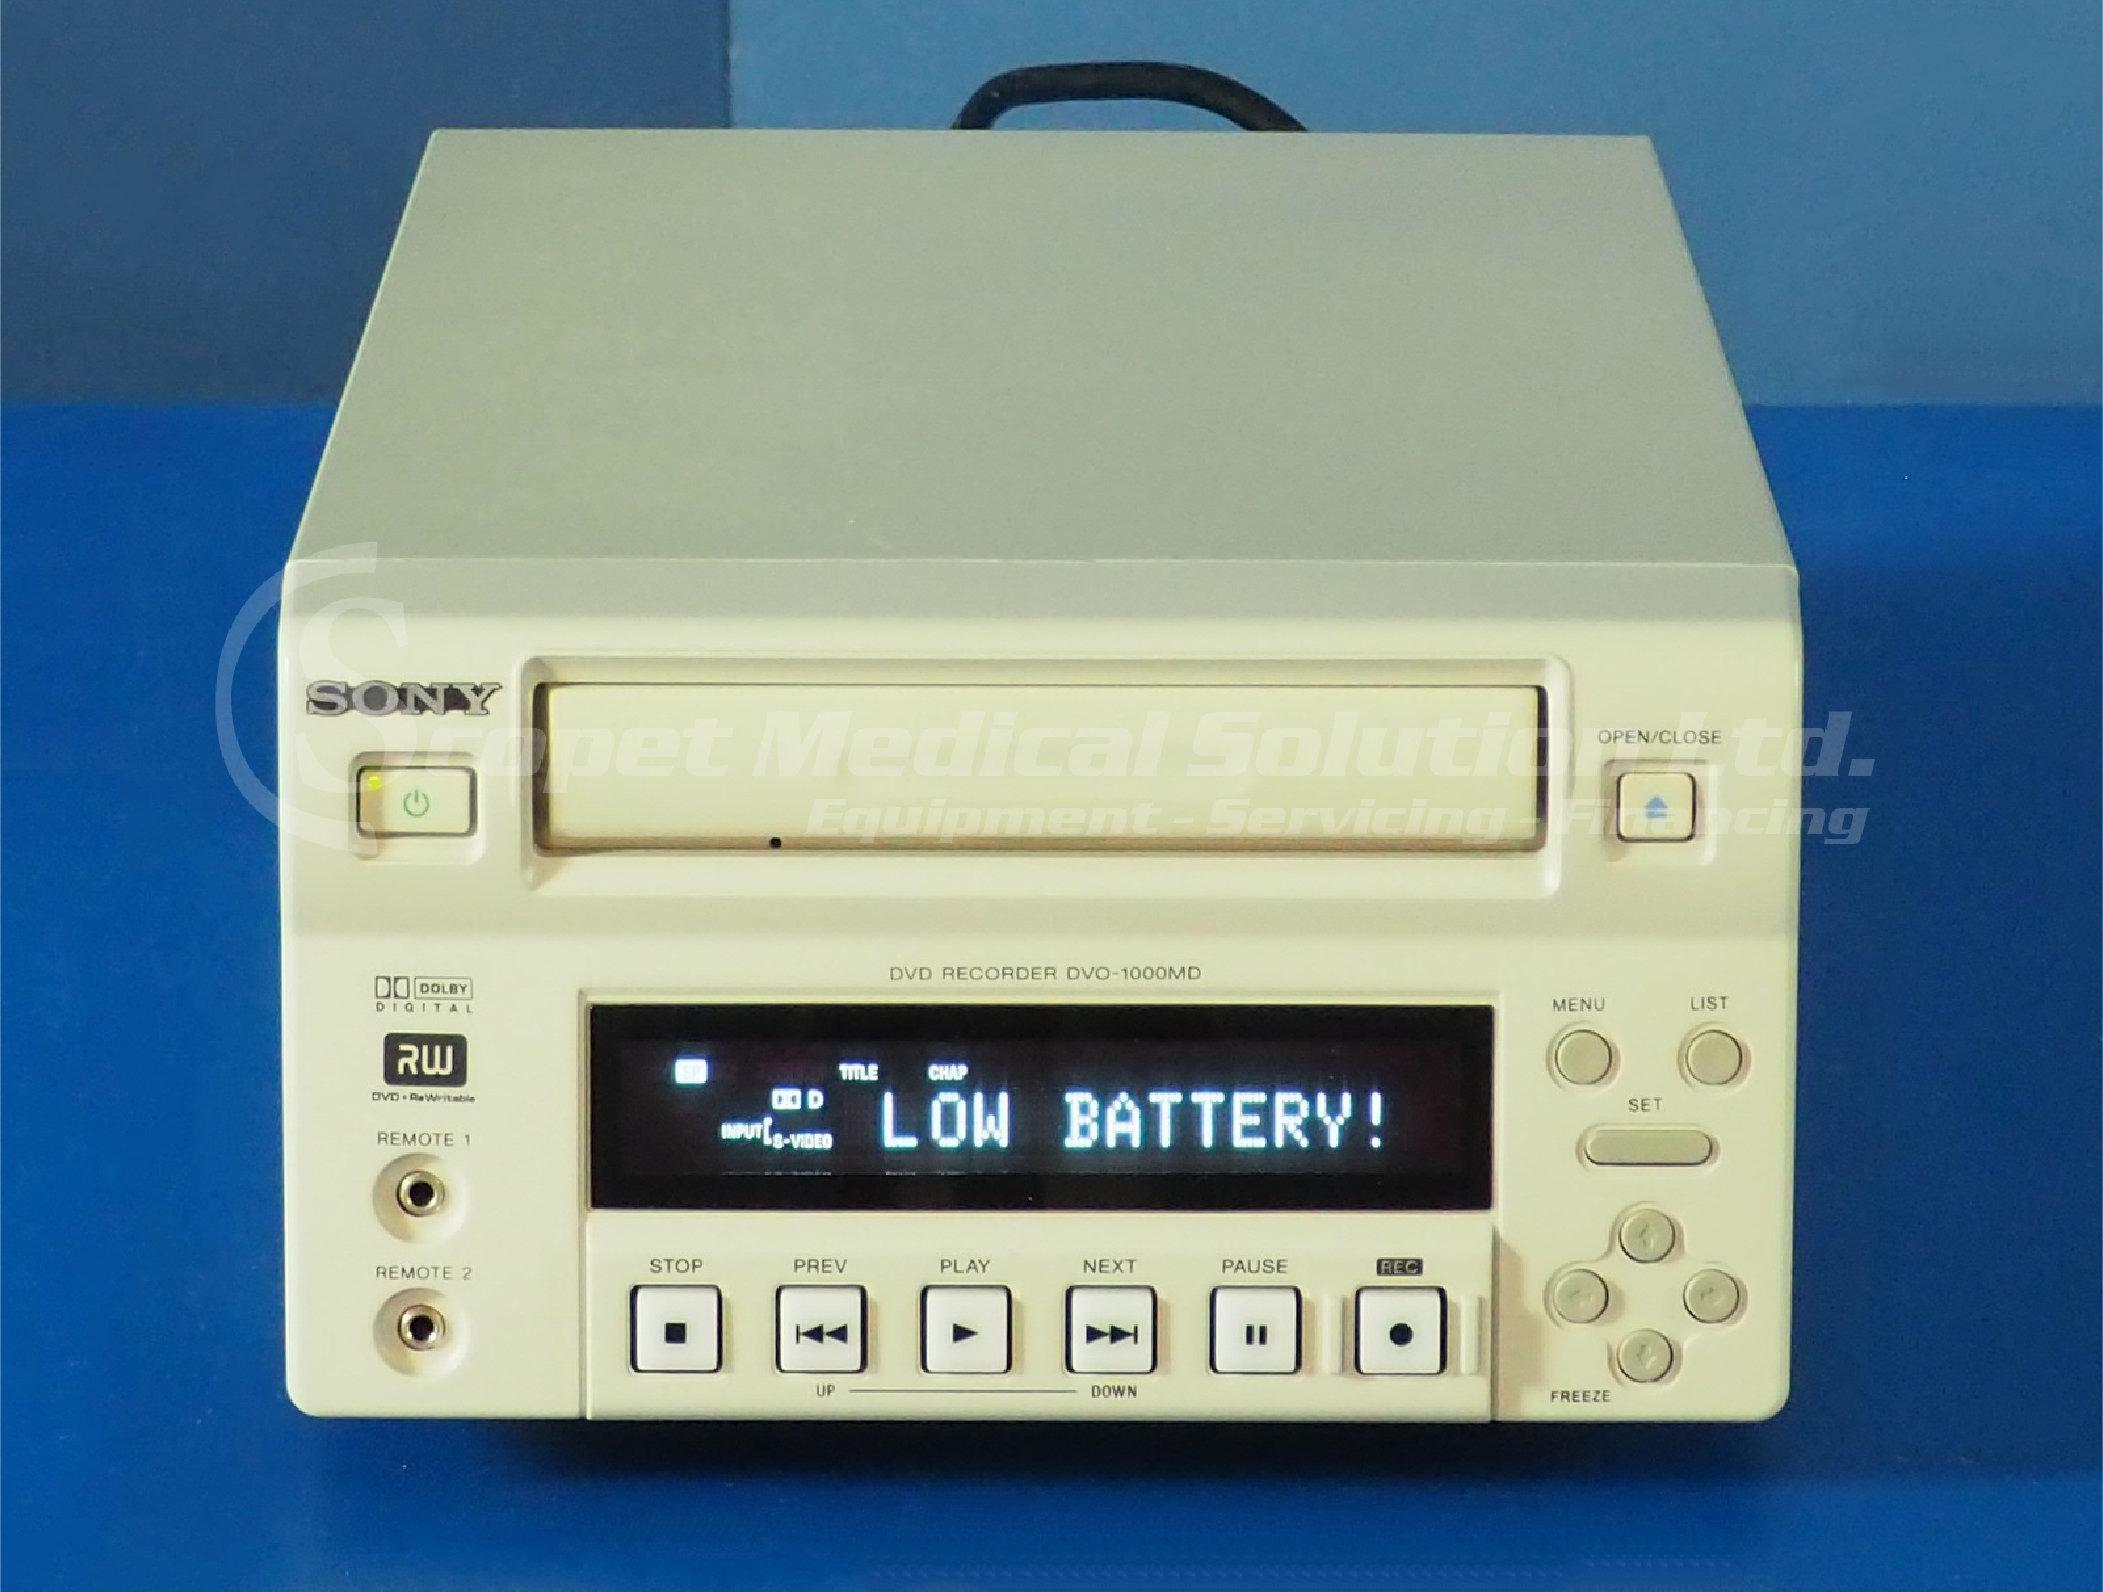 Sony Dv0 1000md Medical Recorder For Sale Bimedis Id1250509